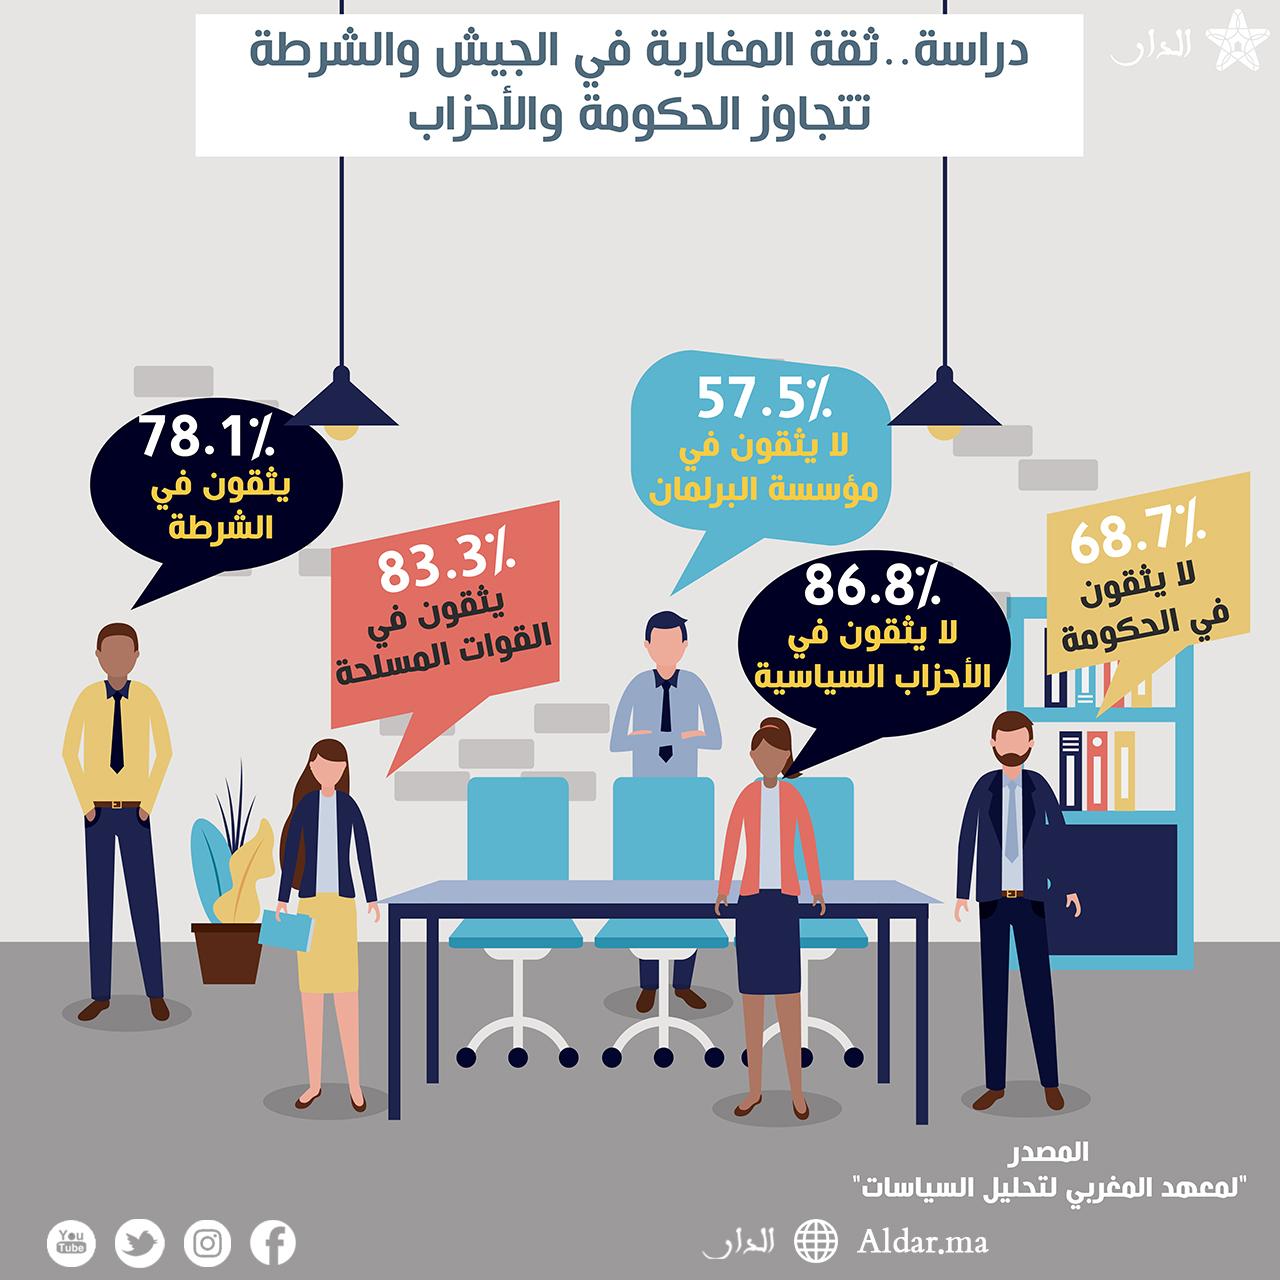 Photo of دراسة..ثقة المغاربة في الجيش والشرطة تتجاوز الحكومة والأحزاب